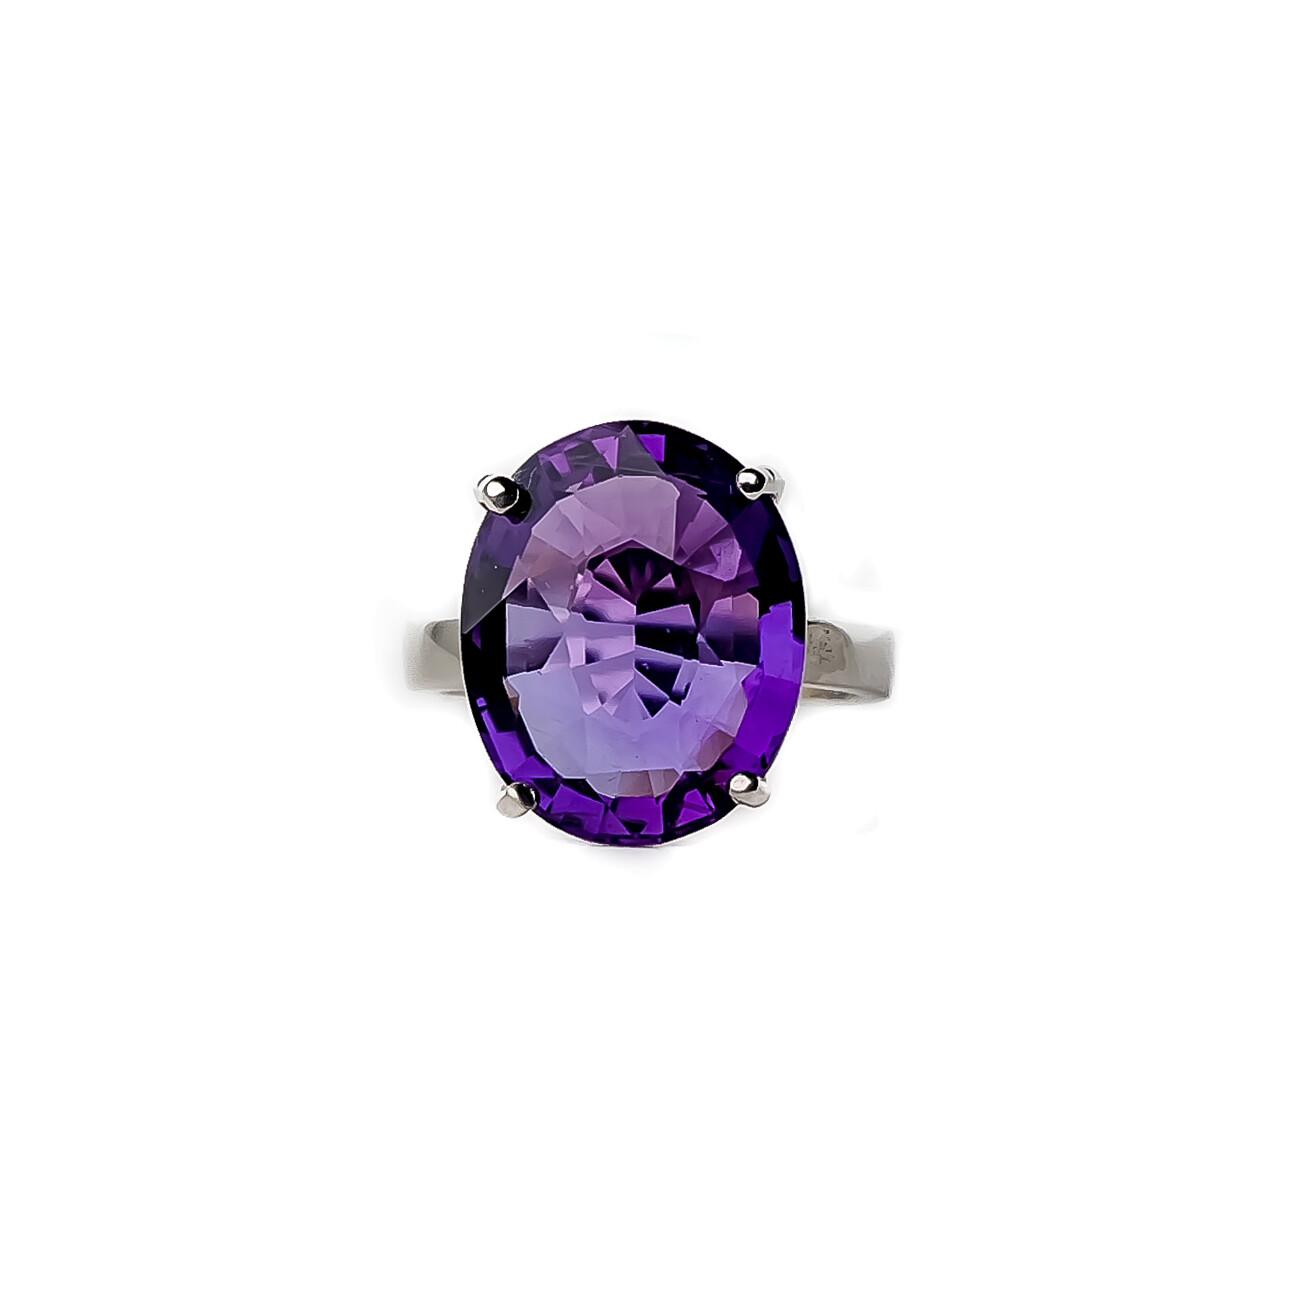 Solitaire Ring - Amethyst- 5⌀ (Vermeil)